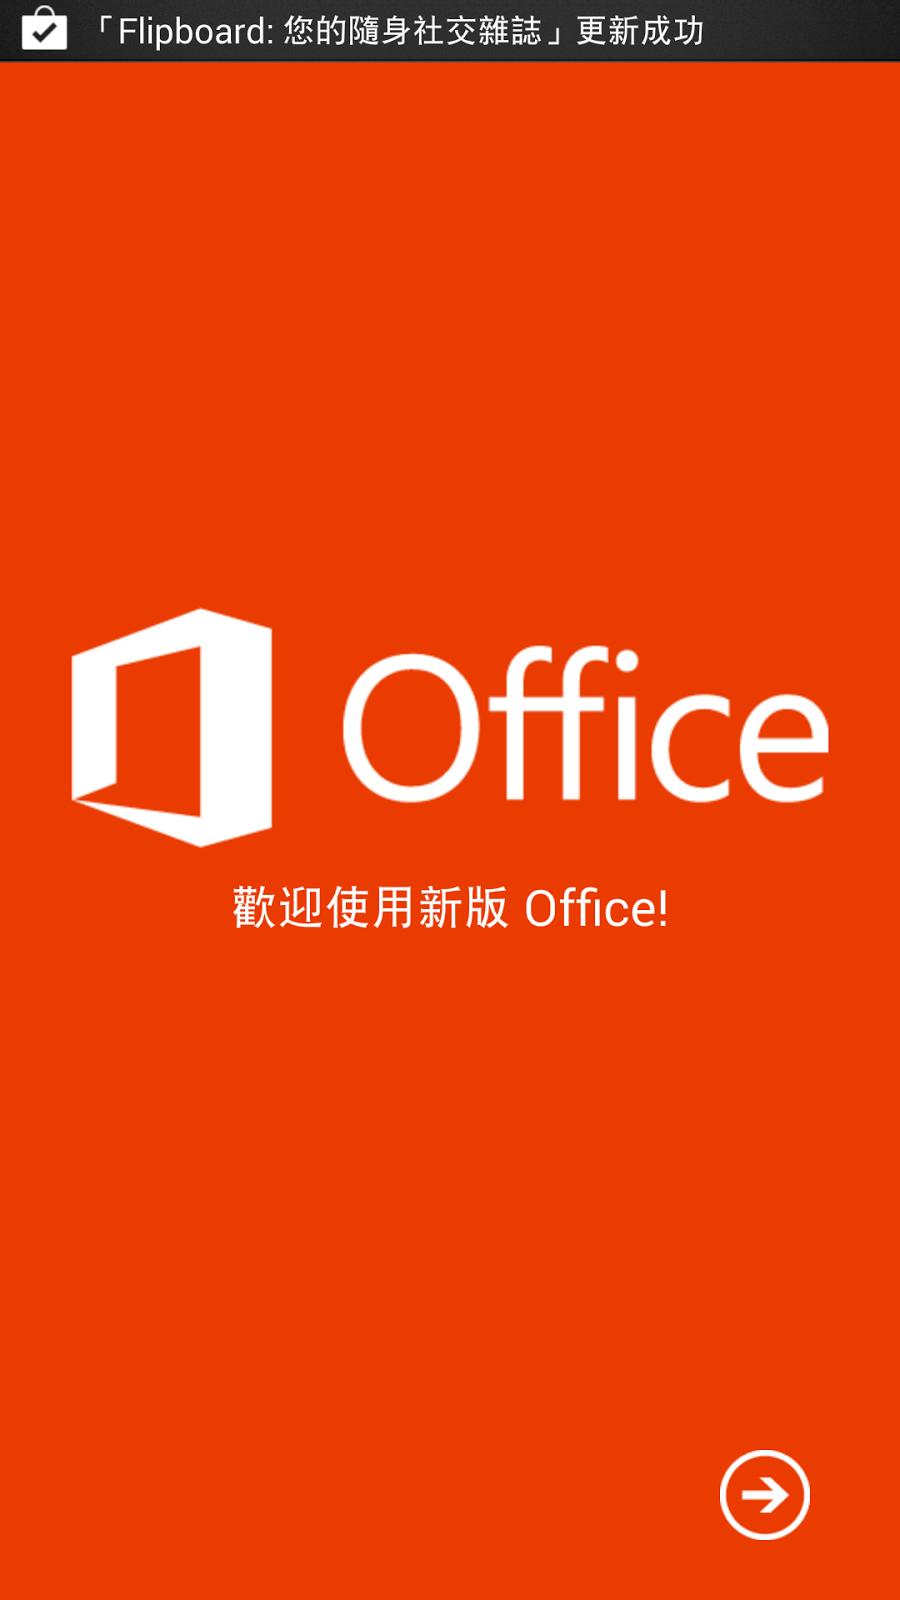 改變行動工作!電腦玩物 2014 最佳 Android App 推薦 office+mobile+free-02